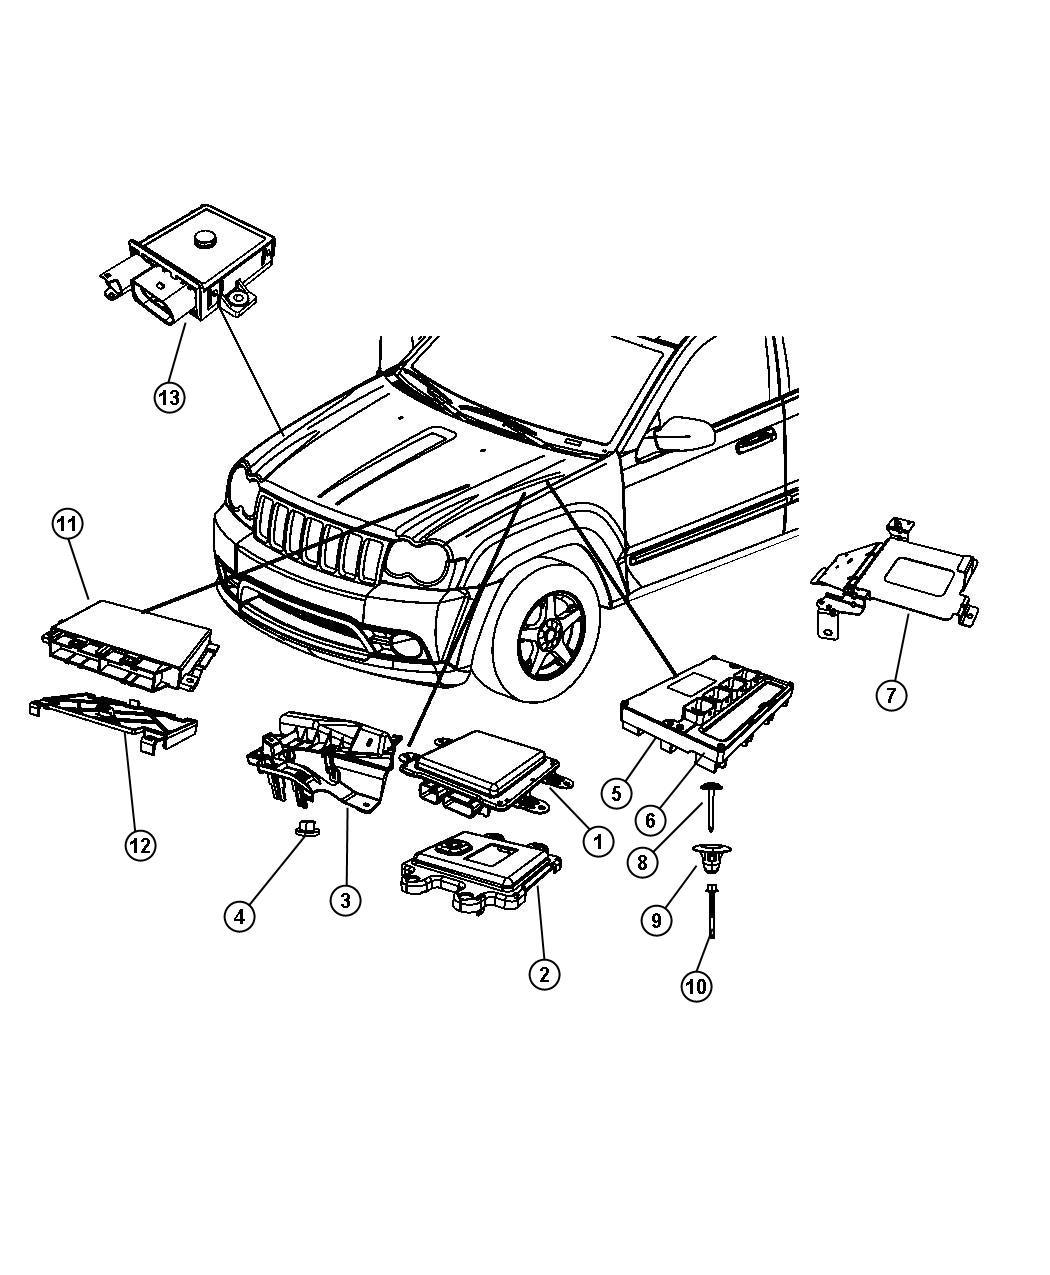 05150500aa jeep module powertrain control generic. Black Bedroom Furniture Sets. Home Design Ideas